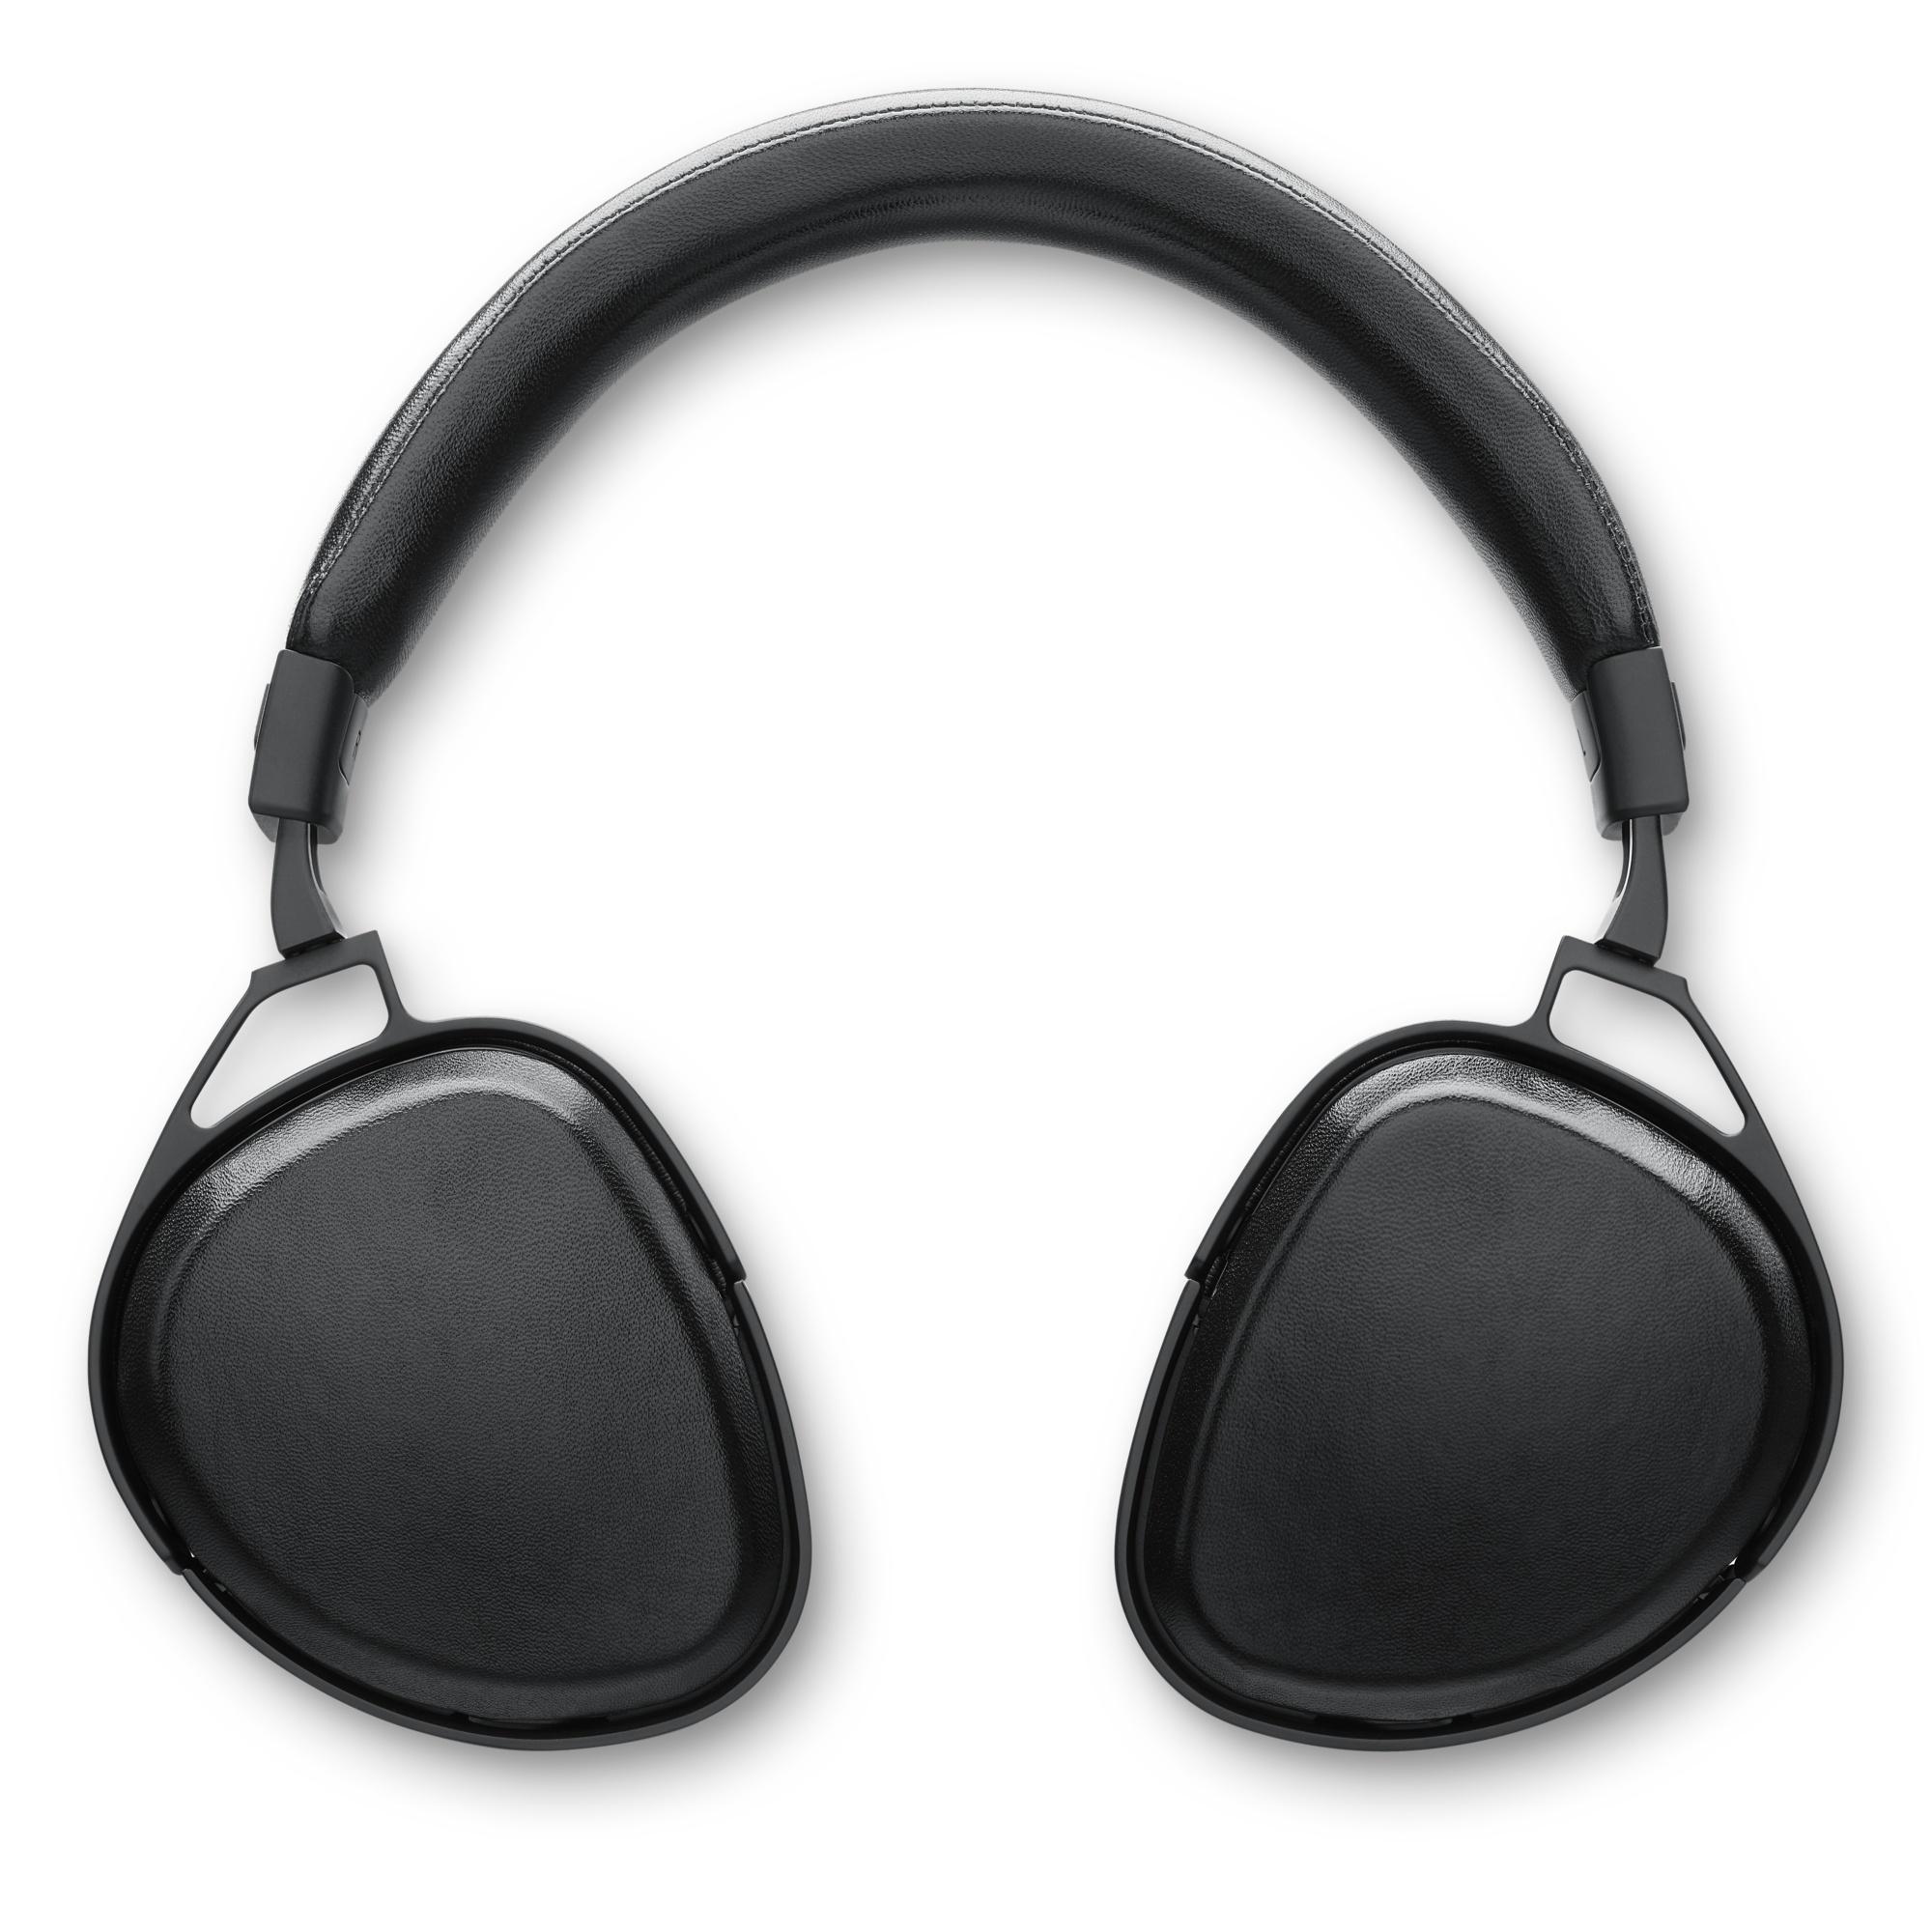 Audeze SINE On-Ear Headphones with Lightning Cable